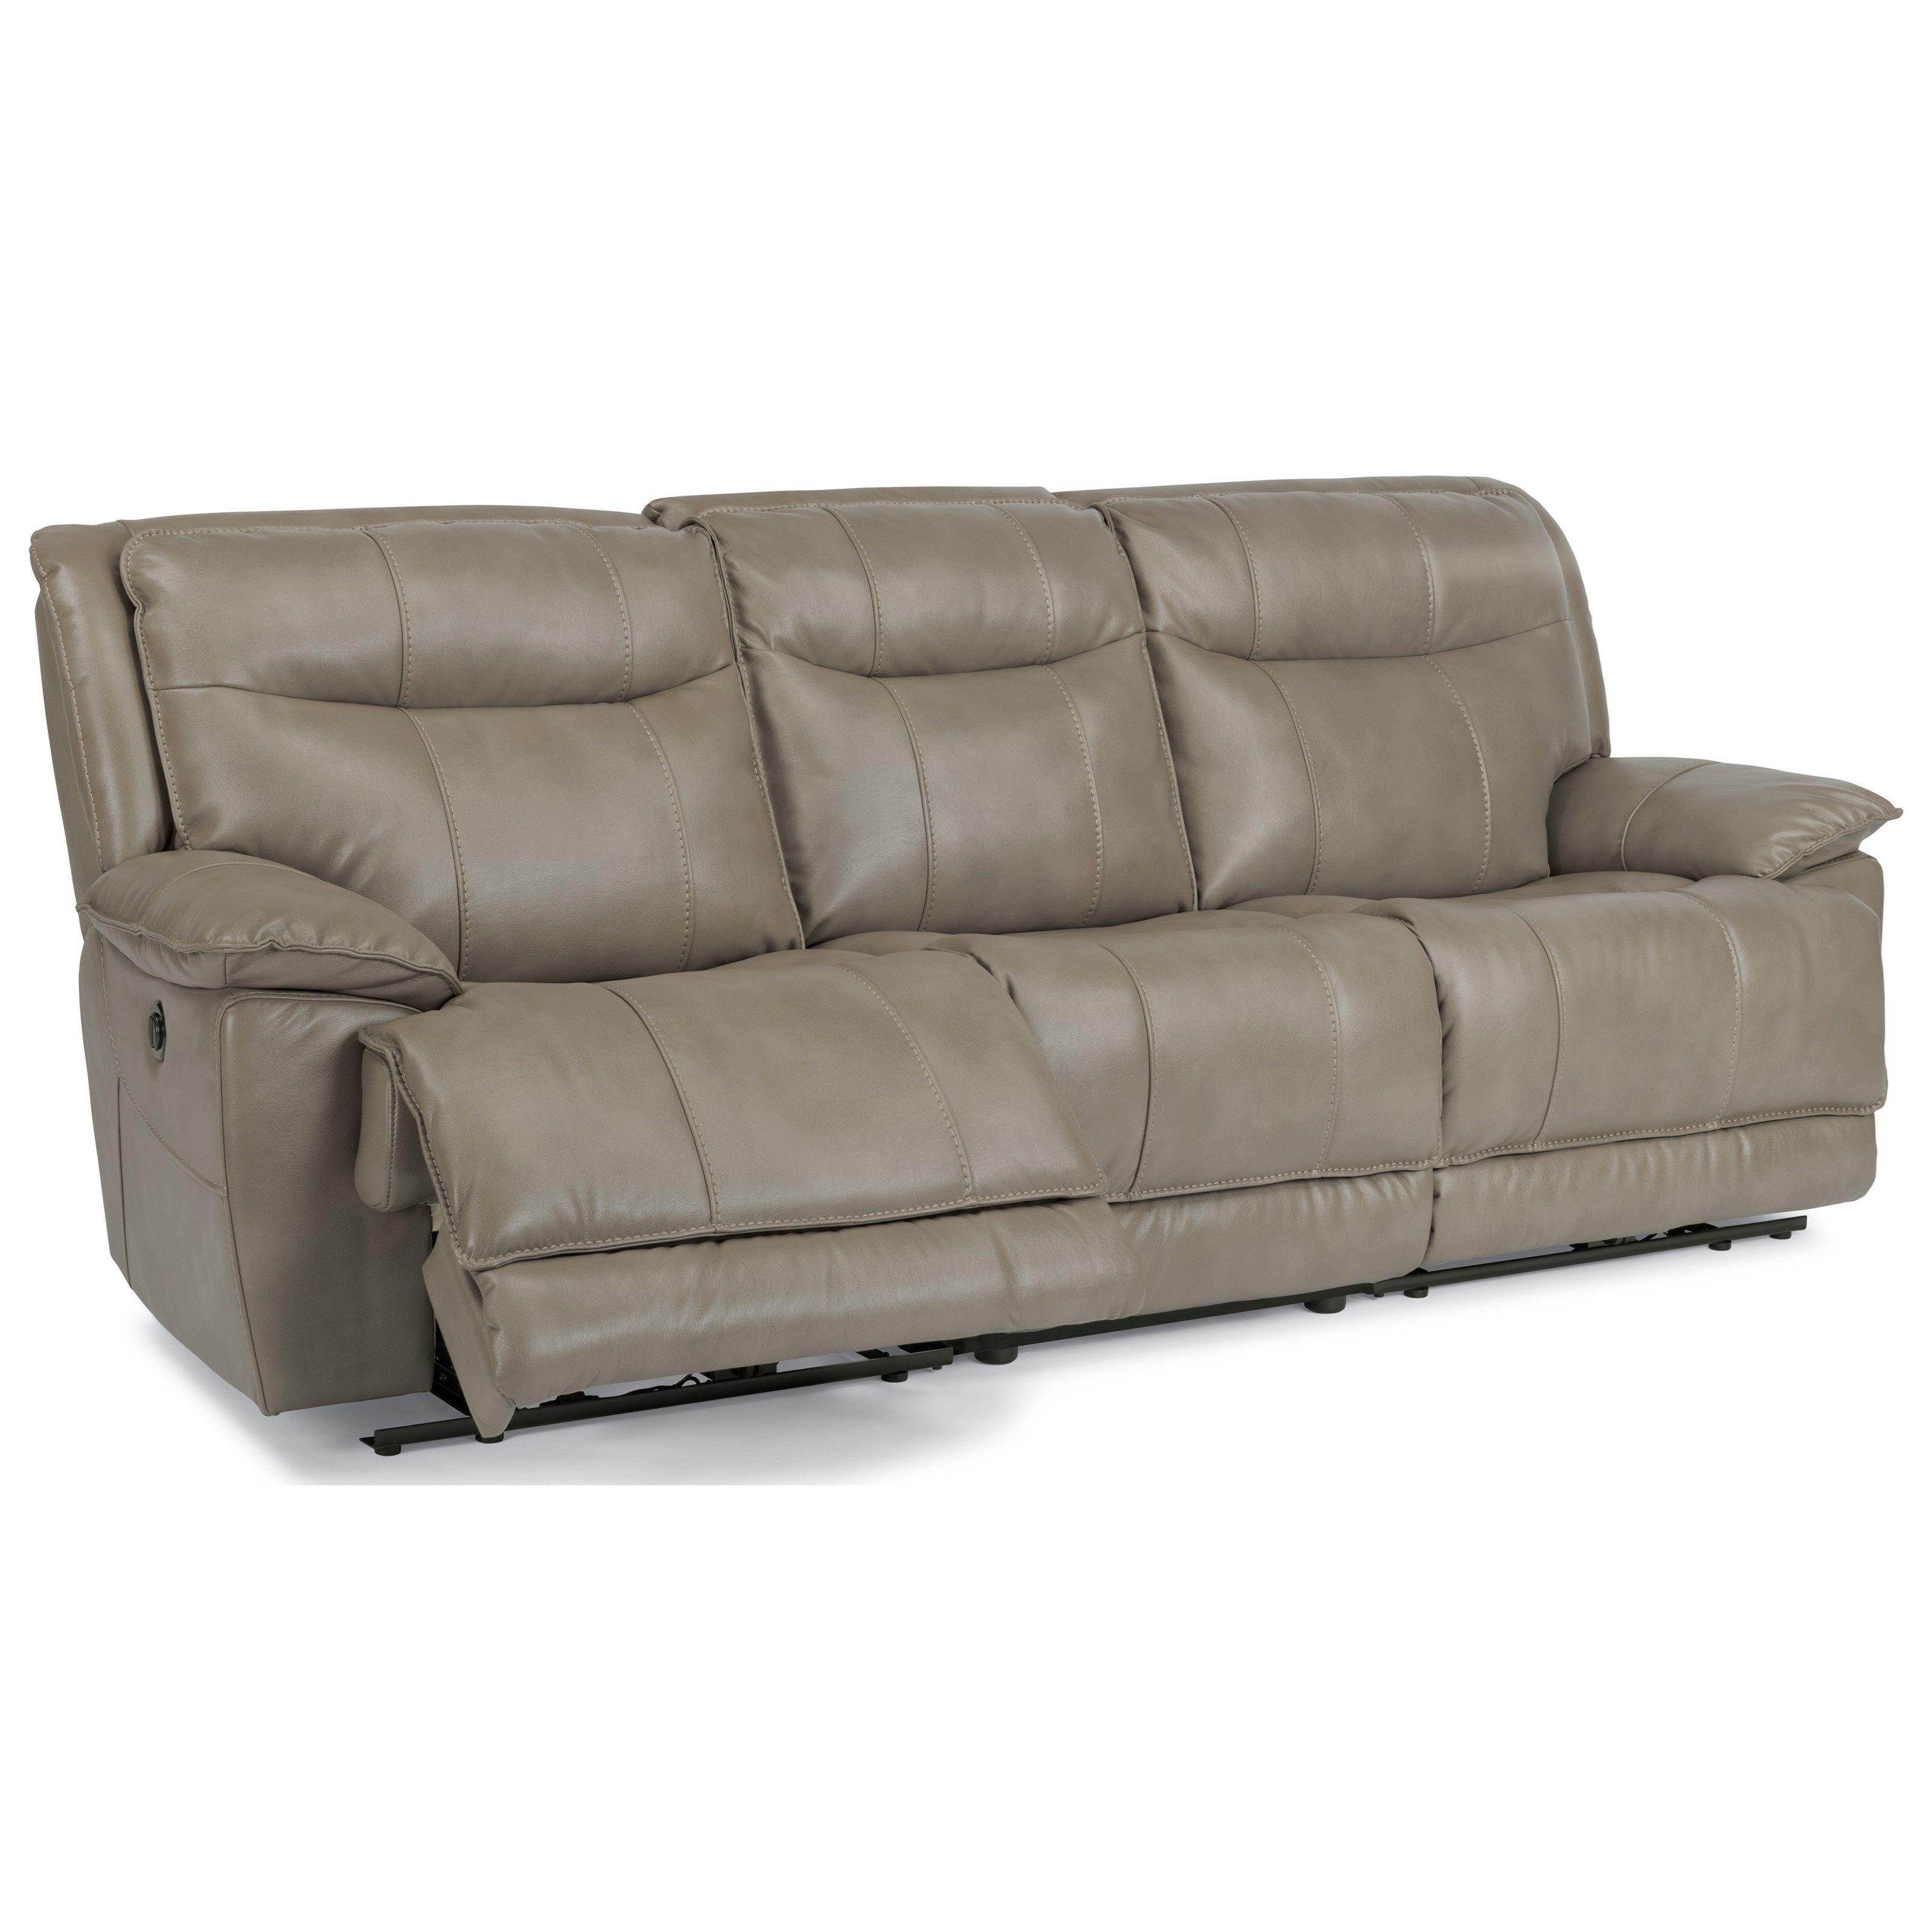 Super Latitudes Bliss Power Reclining Sofa By Flexsteel Fabulous Inzonedesignstudio Interior Chair Design Inzonedesignstudiocom